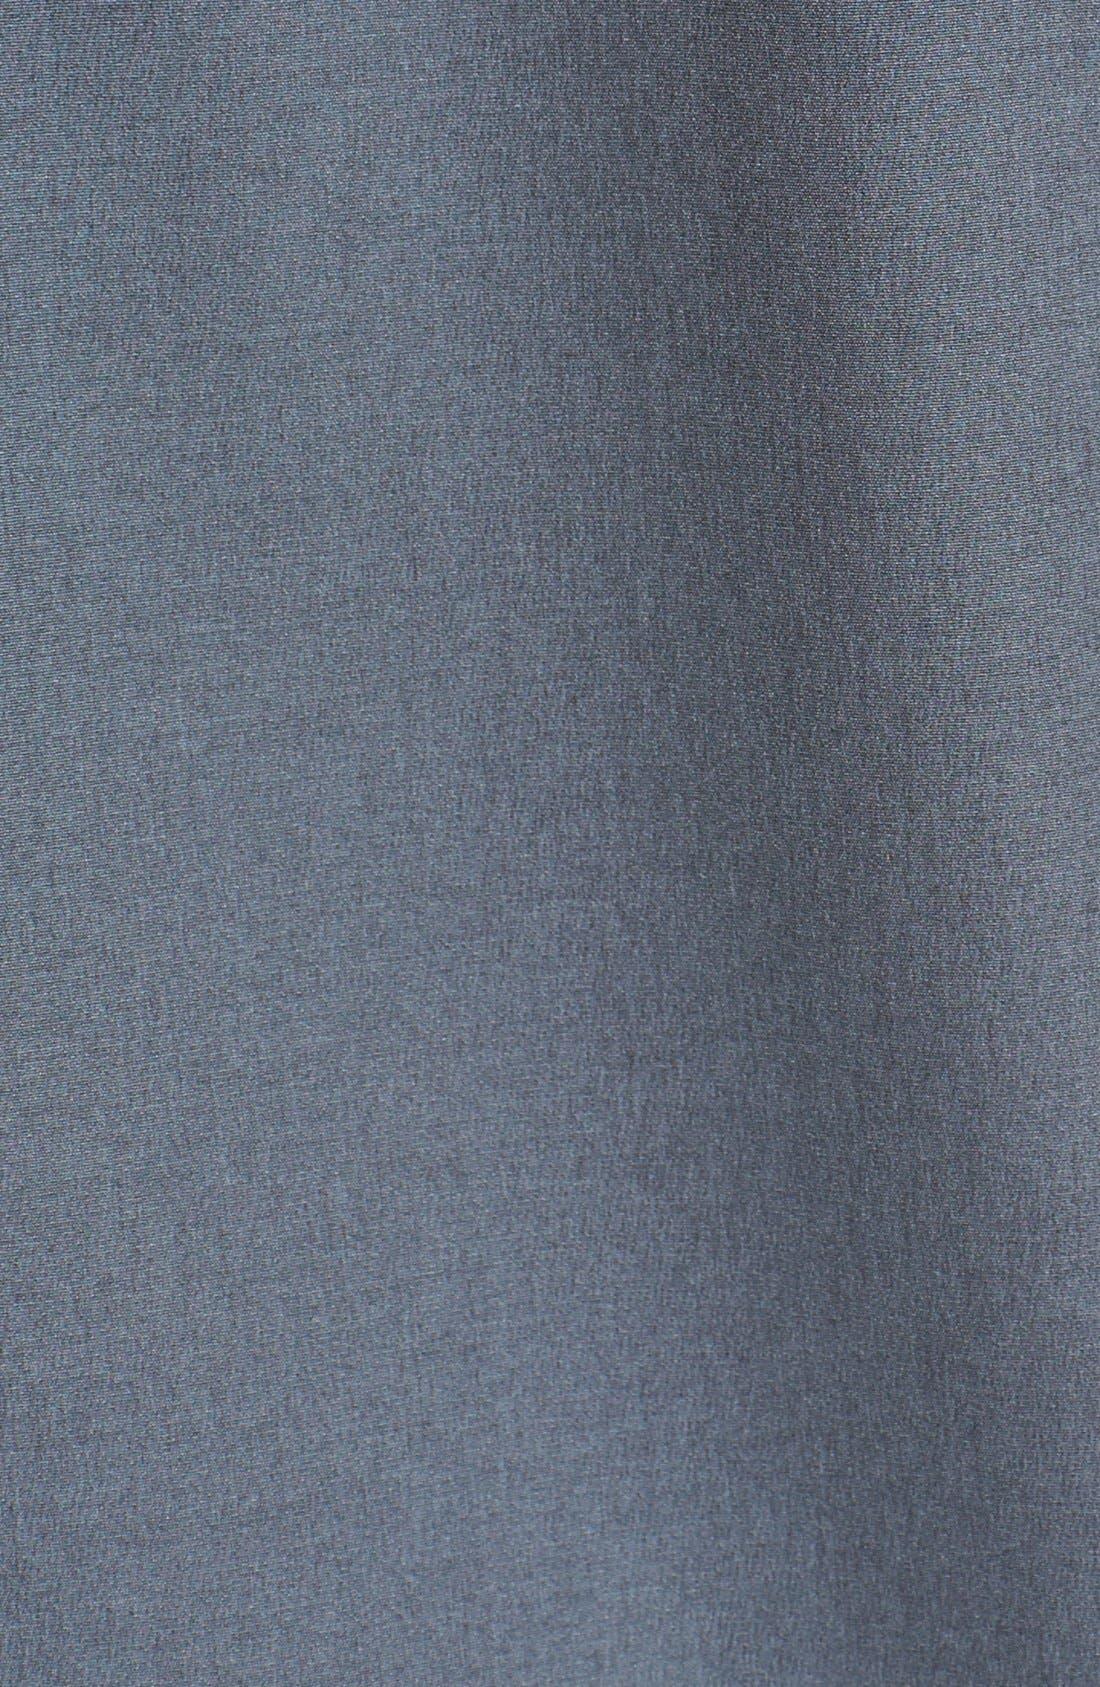 Alternate Image 3  - The North Face 'RDT' FlashDry™ Softshell Jacket